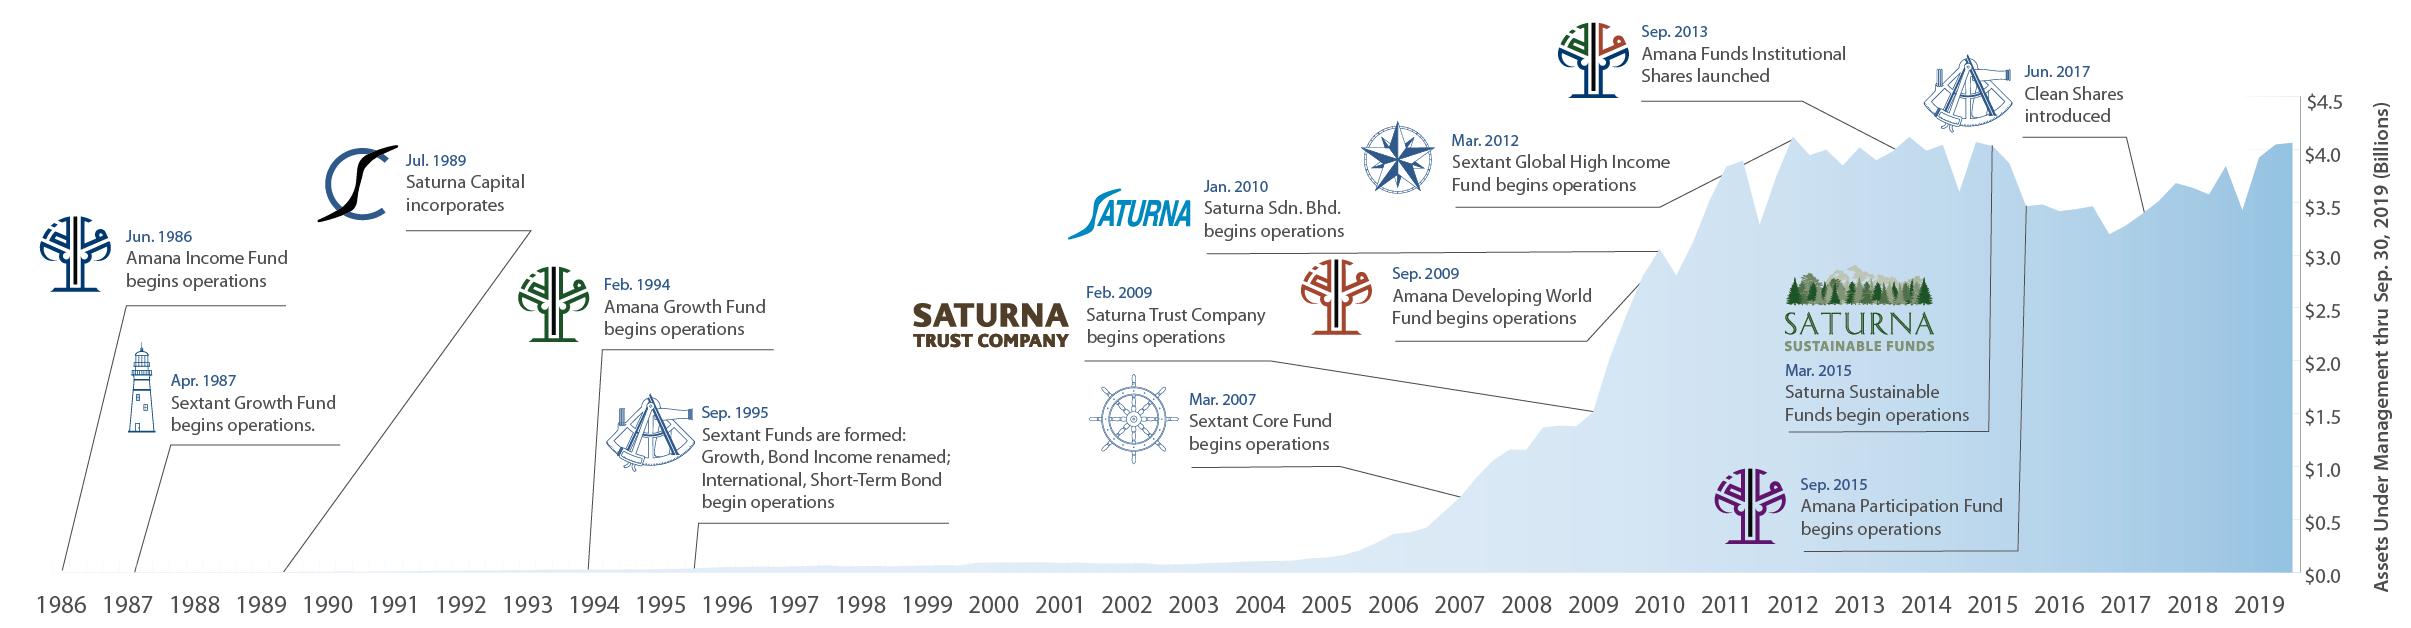 Saturna Capital AUM Timeline